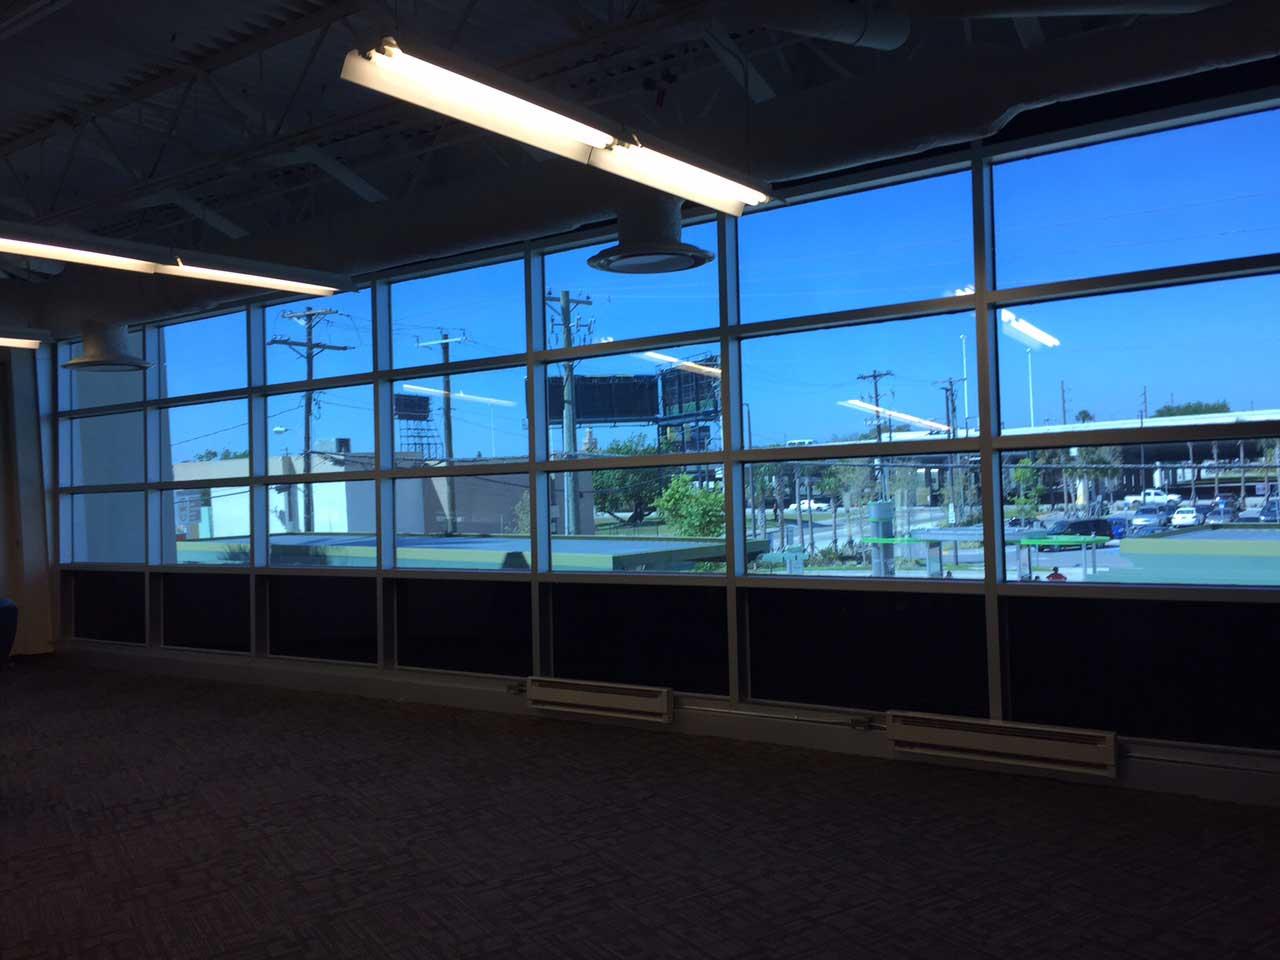 HART - Marion Transit Center